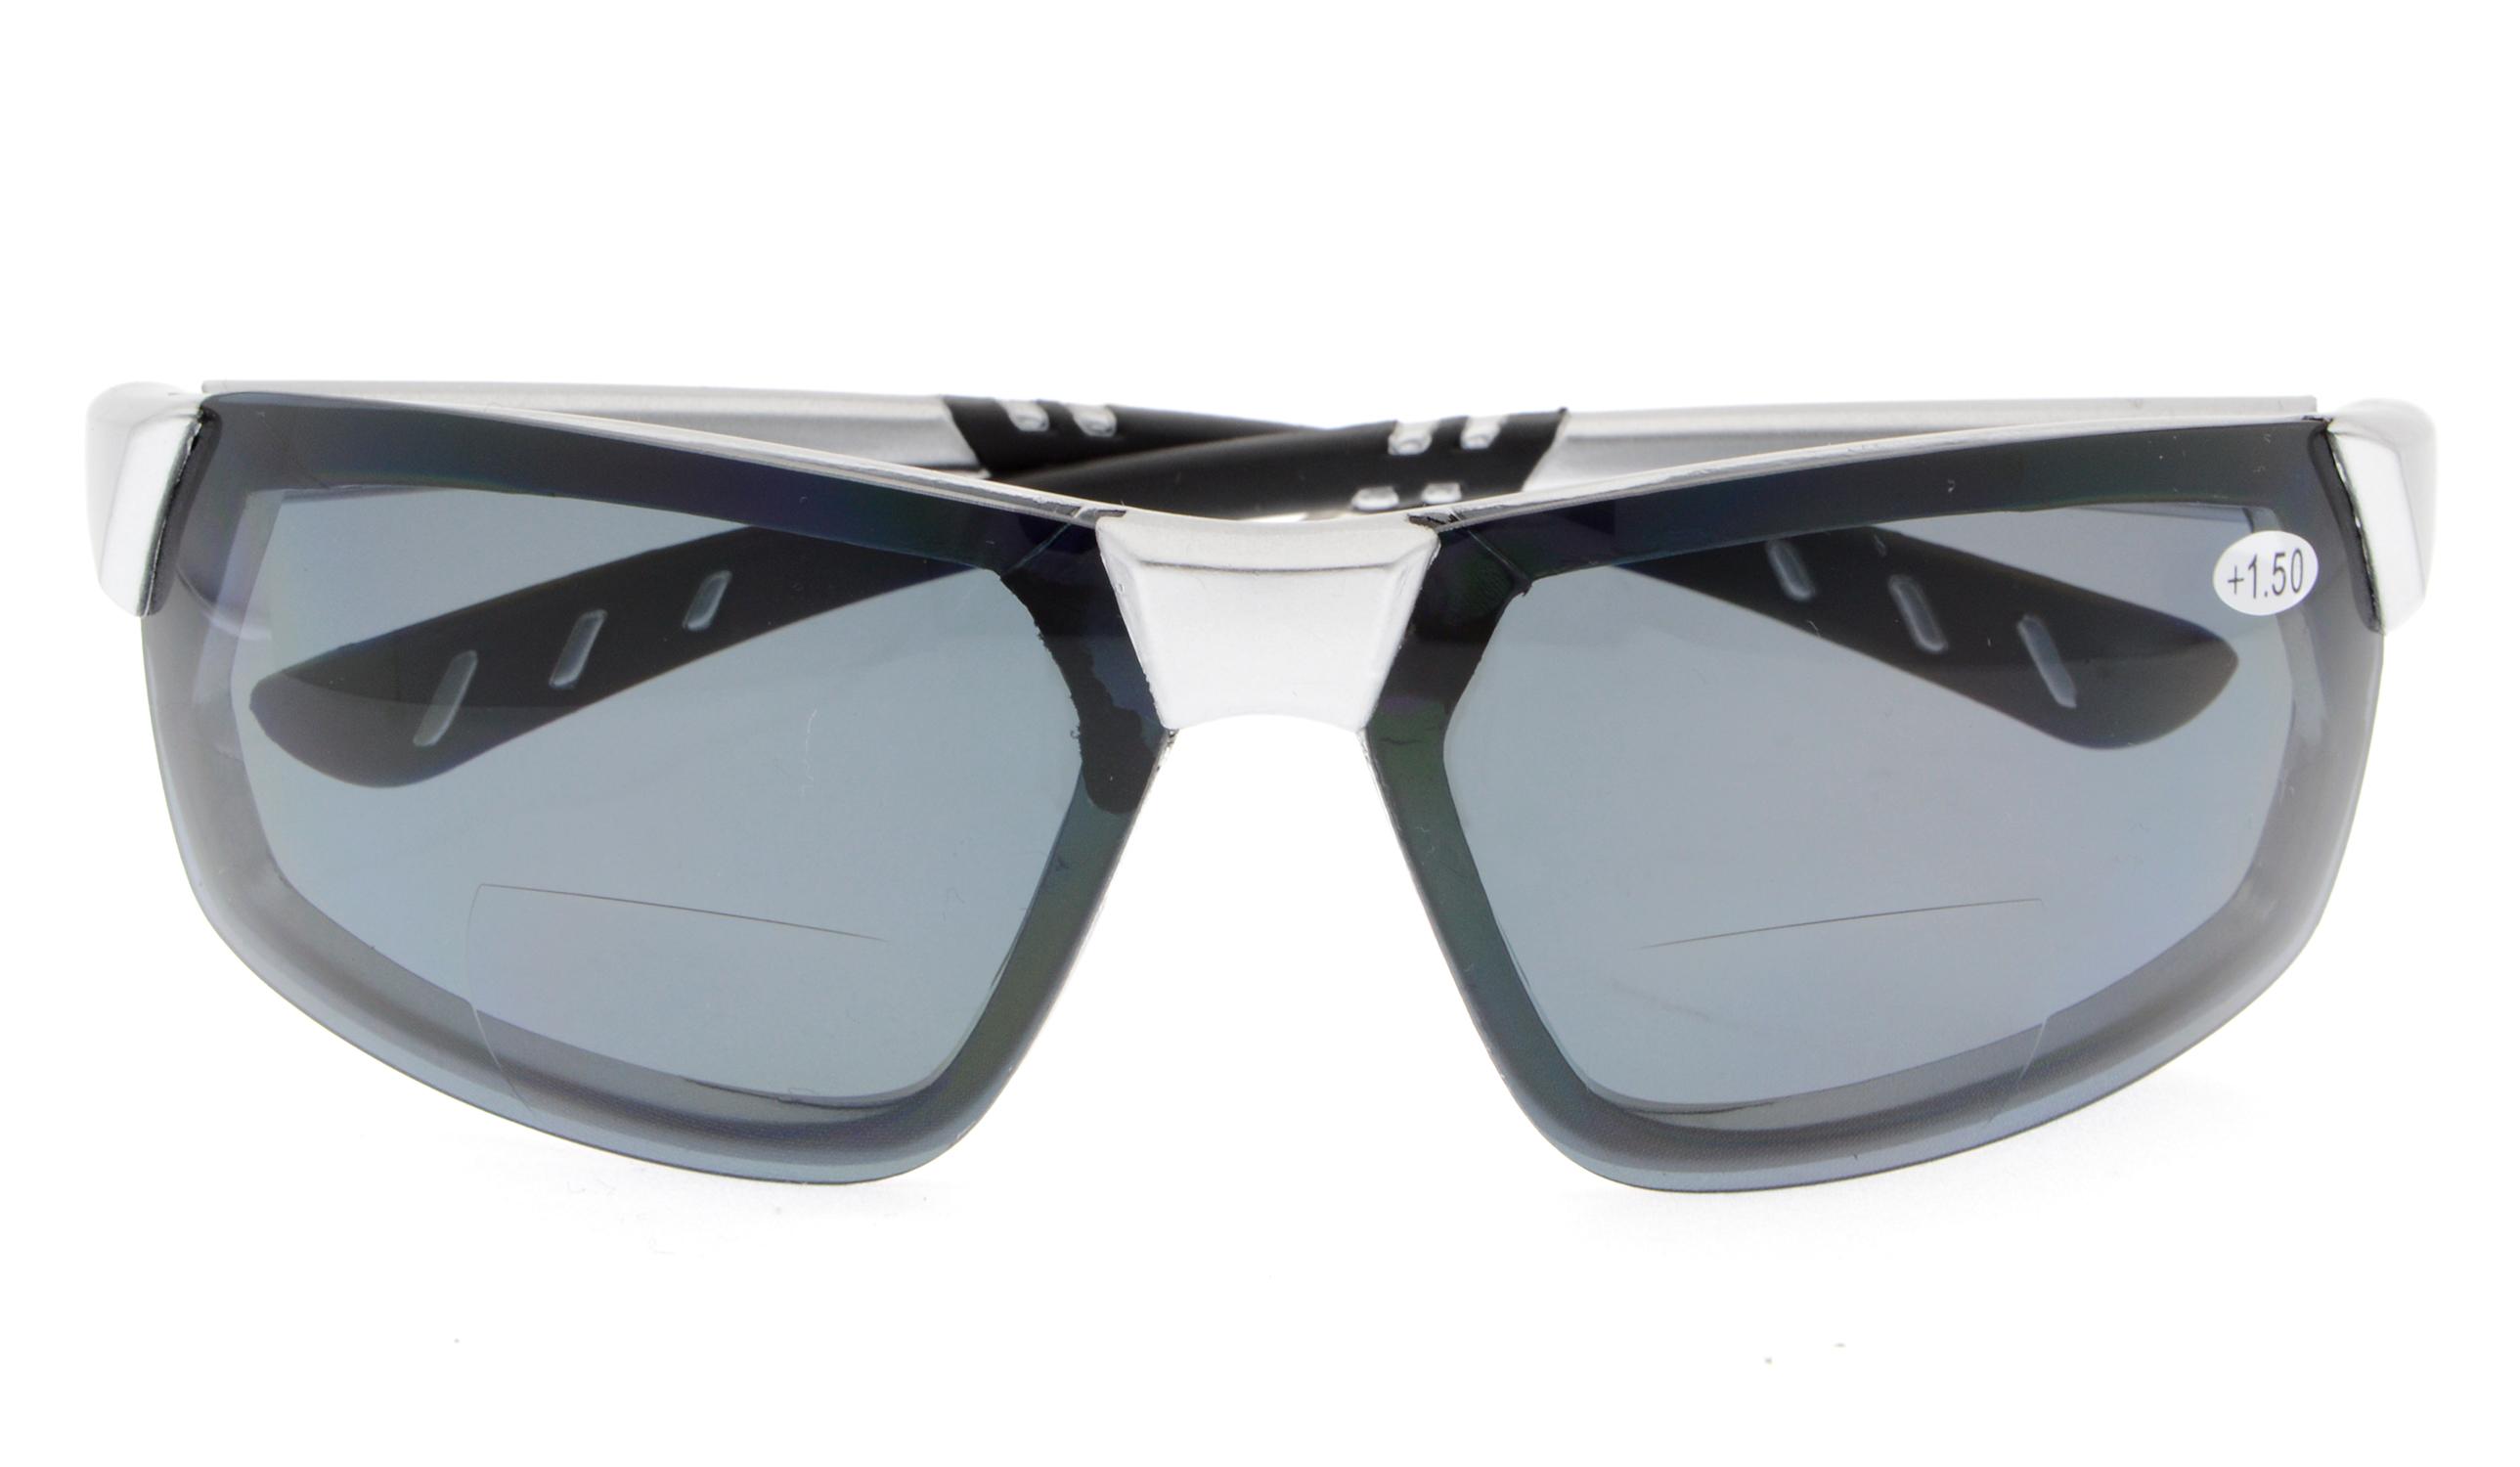 2f0ddc8e47 Eyekepper Bifocal Sunglasses UV400 Quality TR90 Frame Tinted Lens Sun  Readers Women Men TH6157-Bifocal